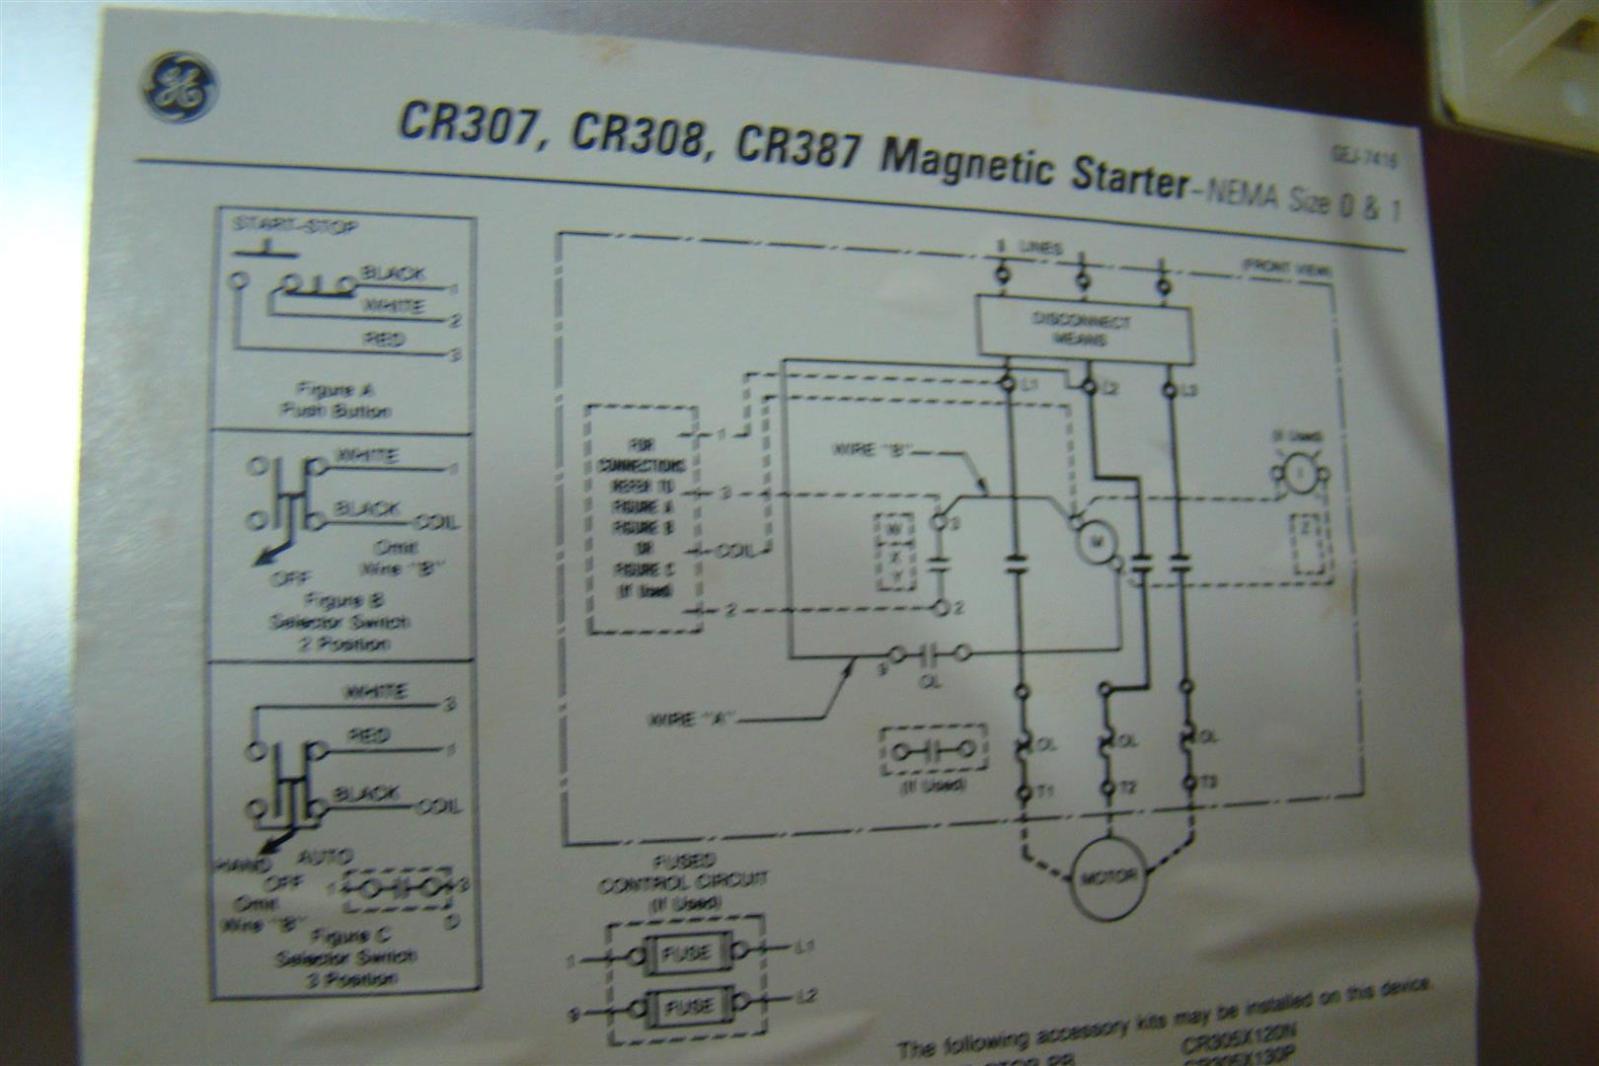 stunning general electric motors wiring diagram photos GE Motor Starter Wiring On and Off  GE 300 Line Motor Starters GE 8 000 Motor Starter Wiring Diagram Engine Starter Wiring